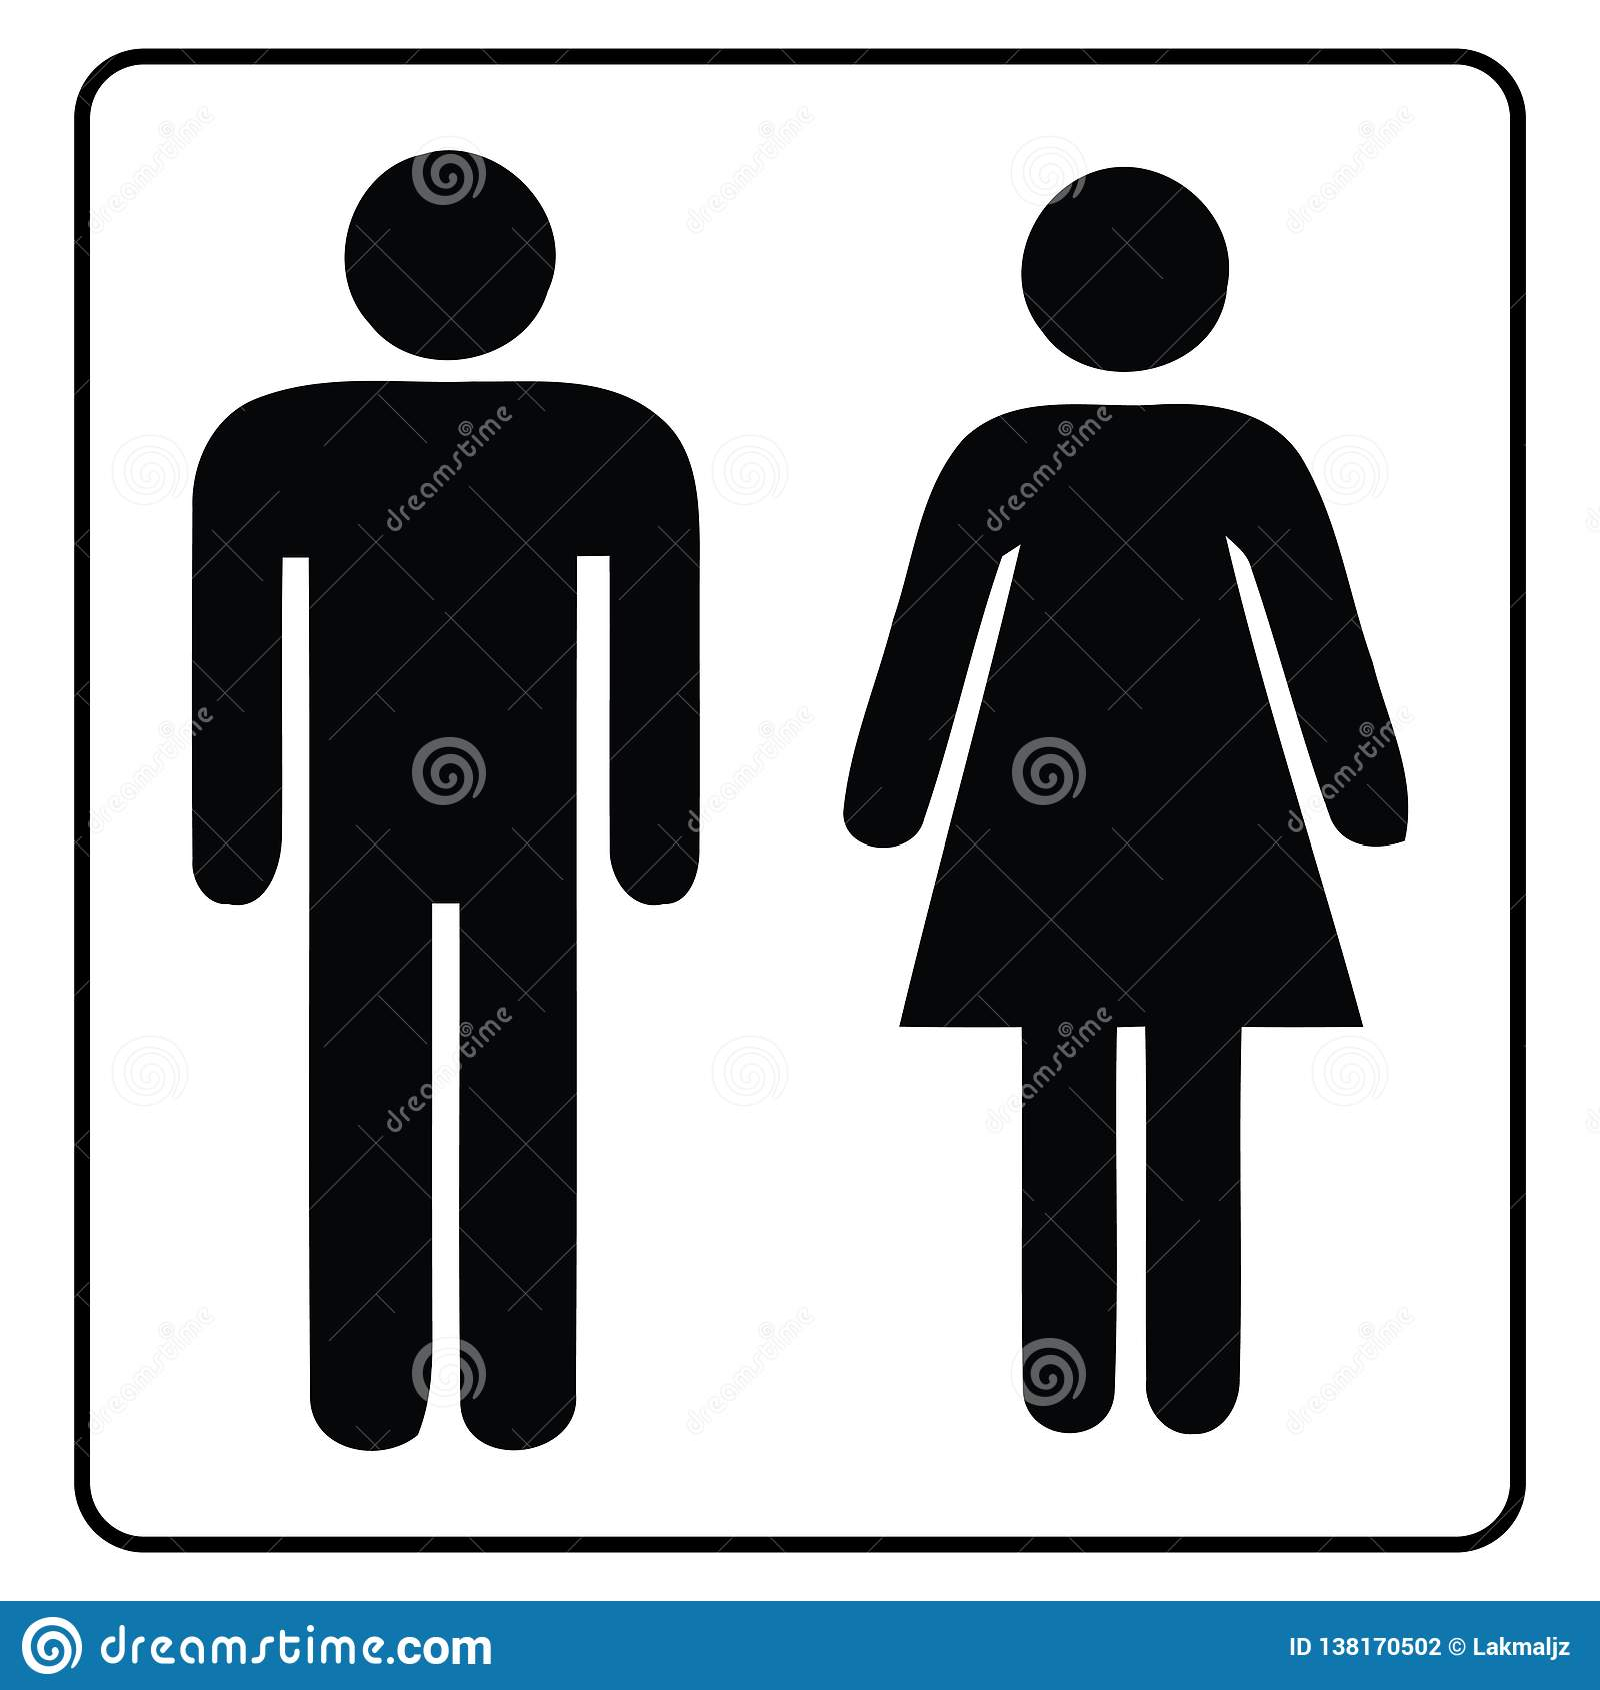 Washroom σημάδι-αρσενικό και θηλυκό